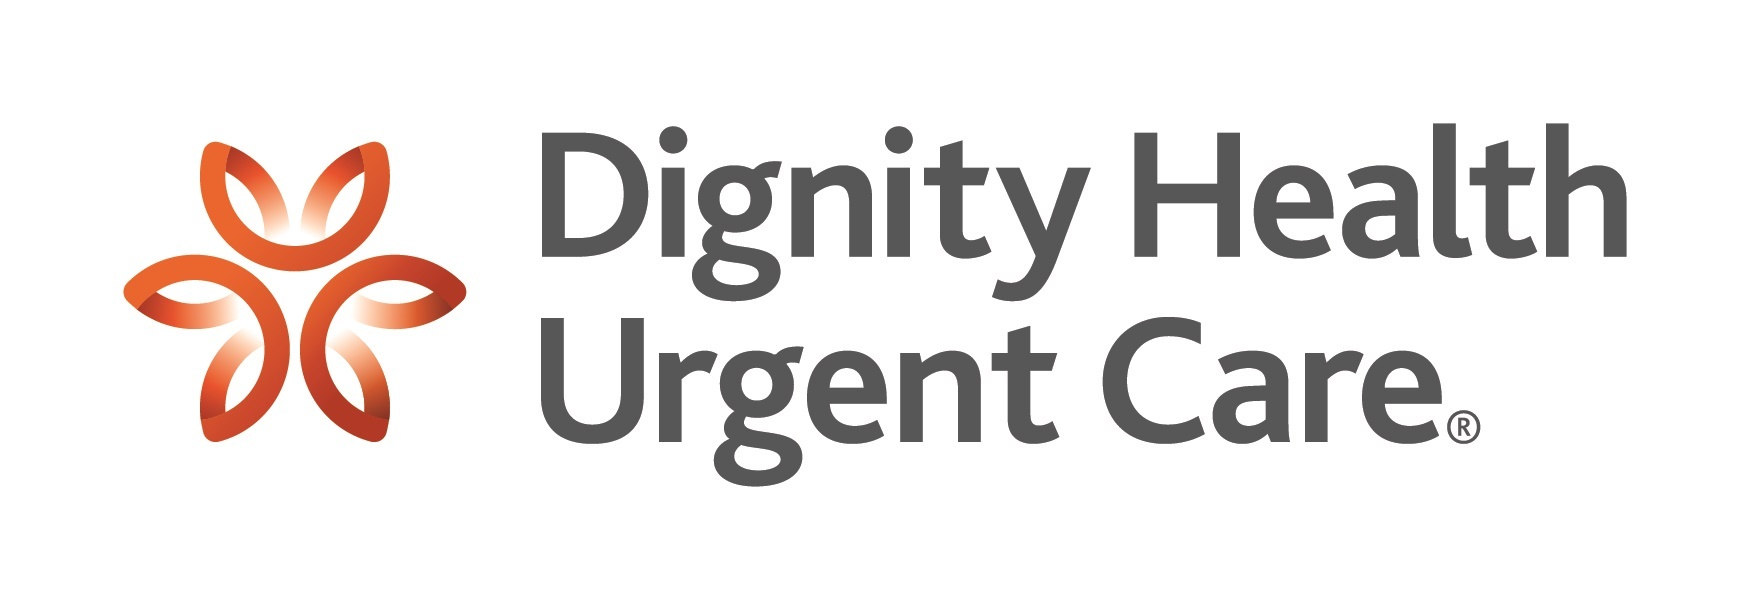 Chairman's Circle Atascadero Chamber Sponsor Dignity Health